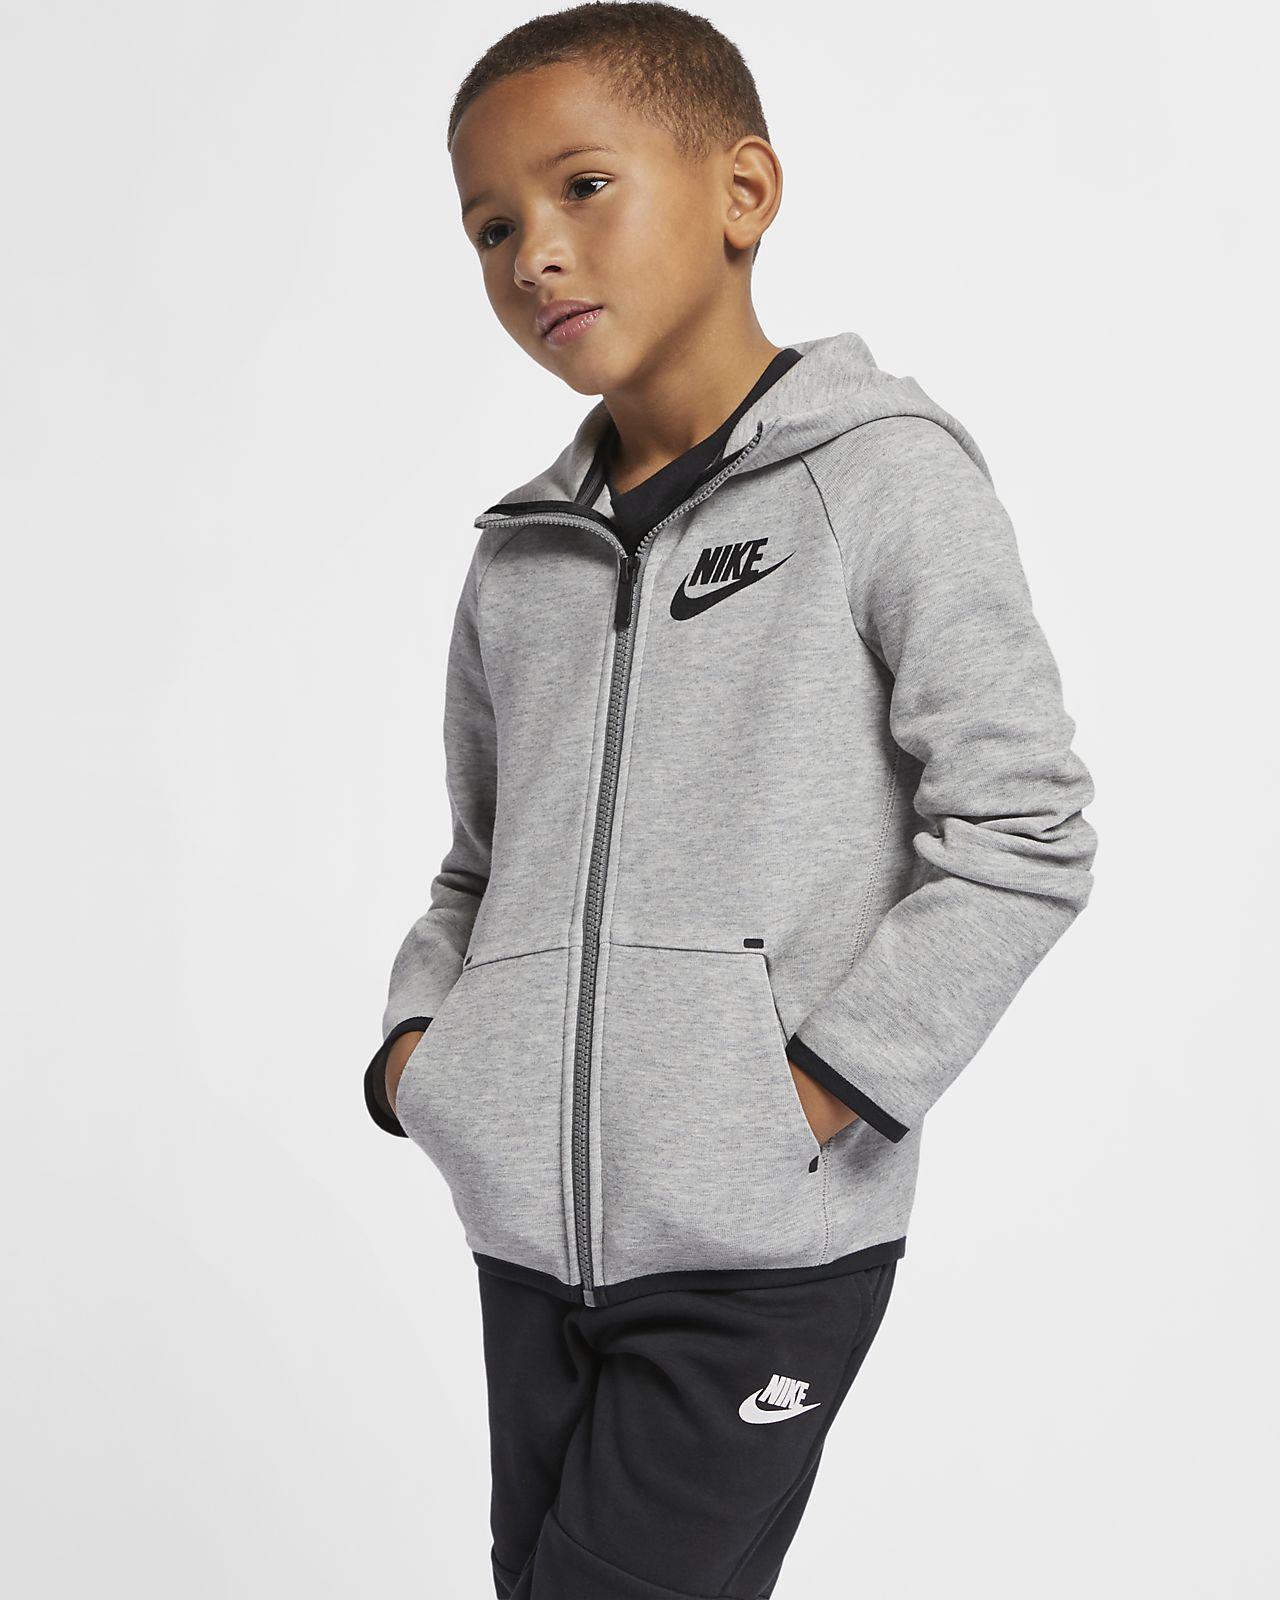 Nike Sportswear Tech Fleece Dessuadora amb caputxa - Nen/a petit/a